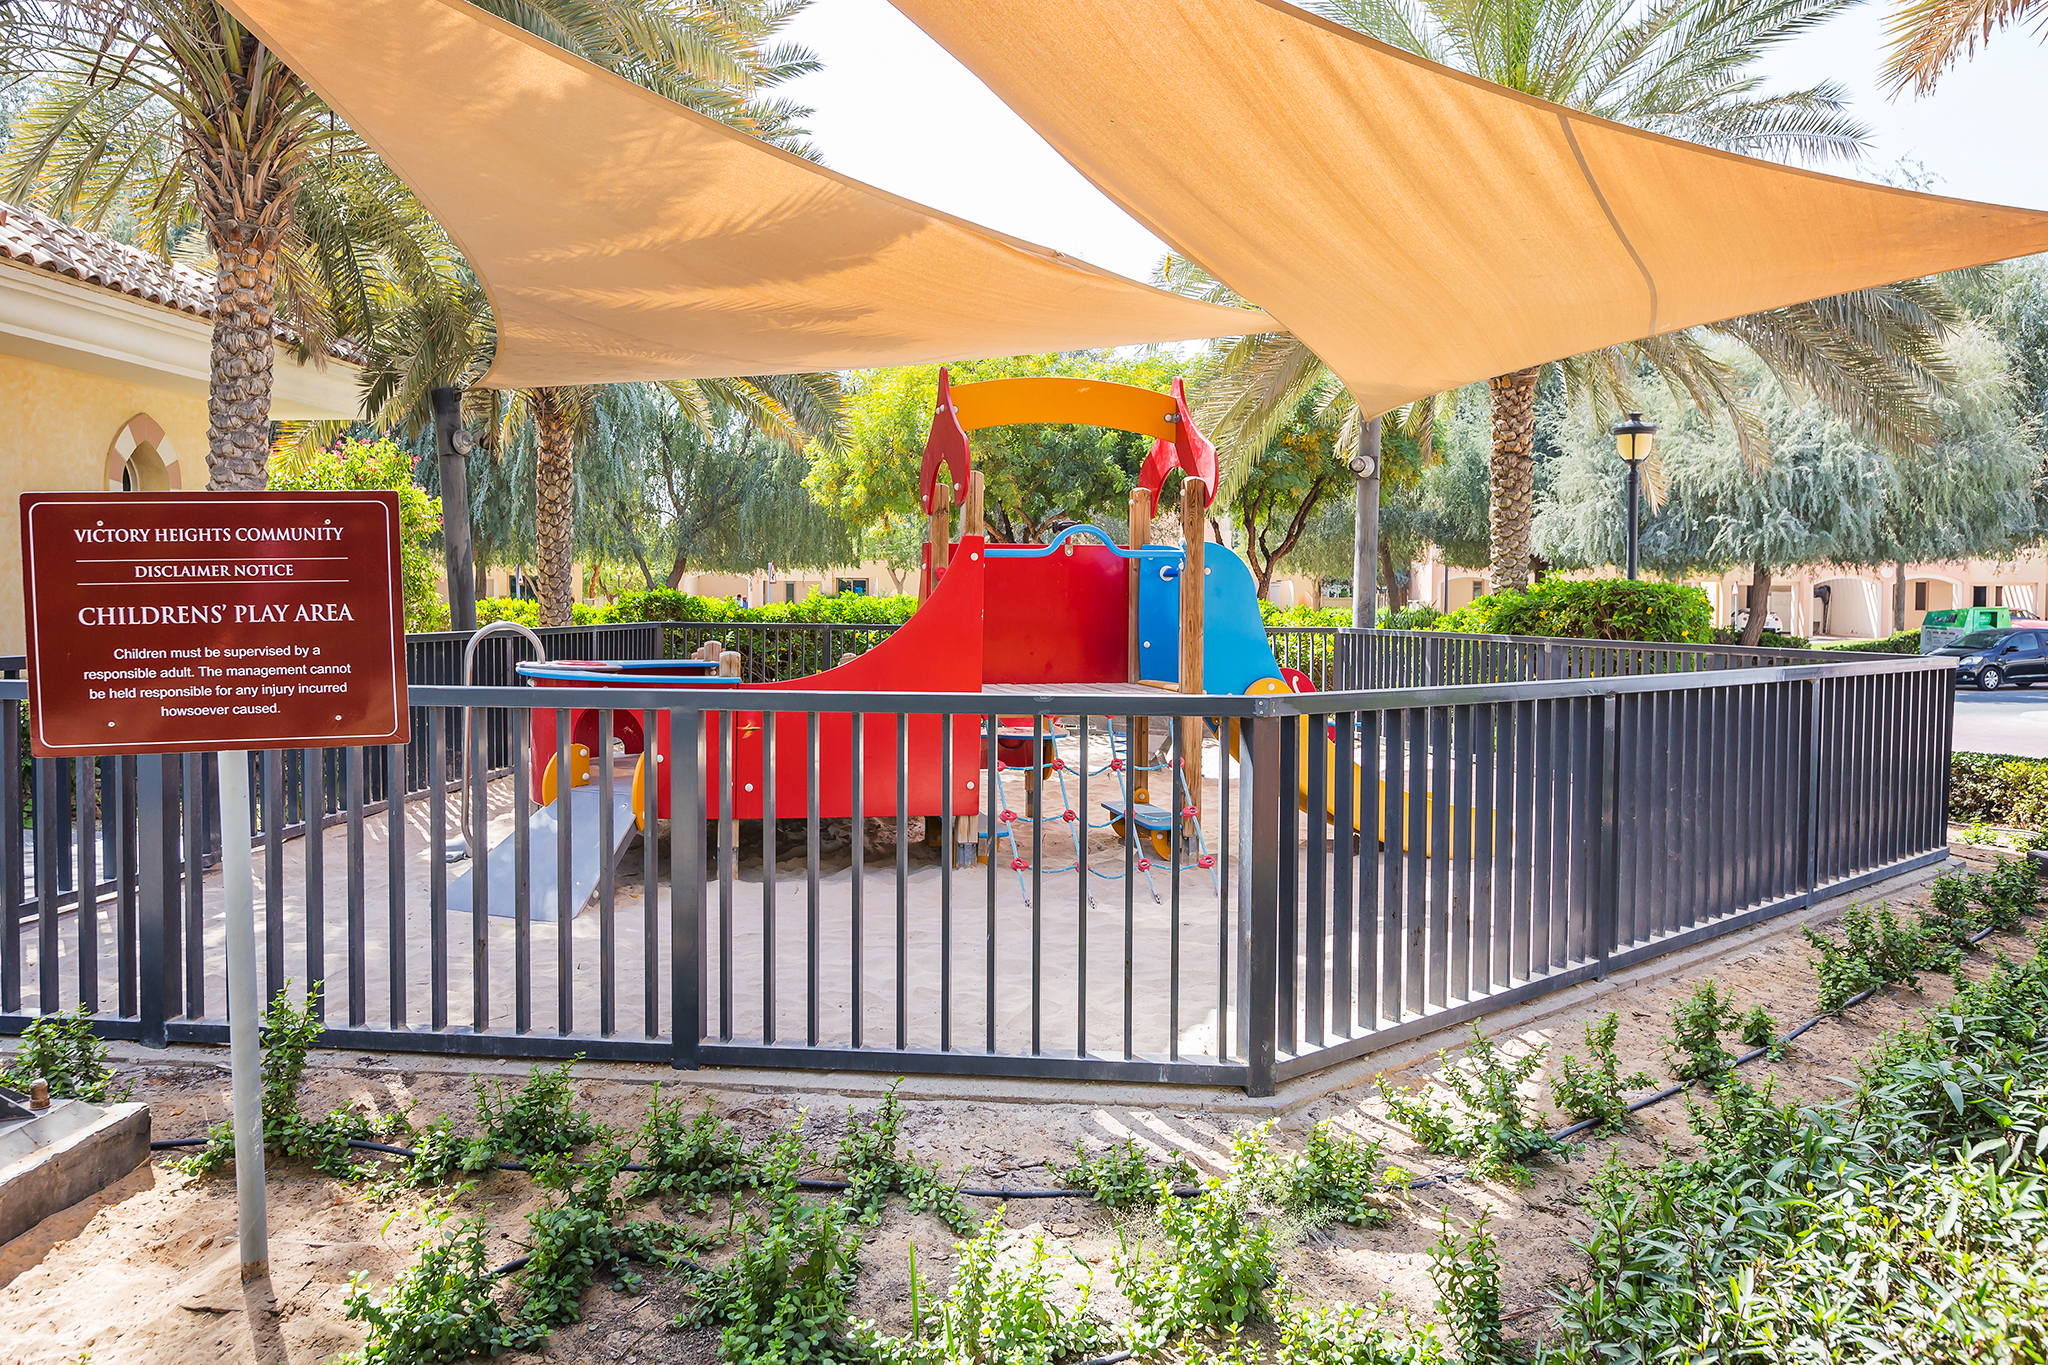 Community children's play area